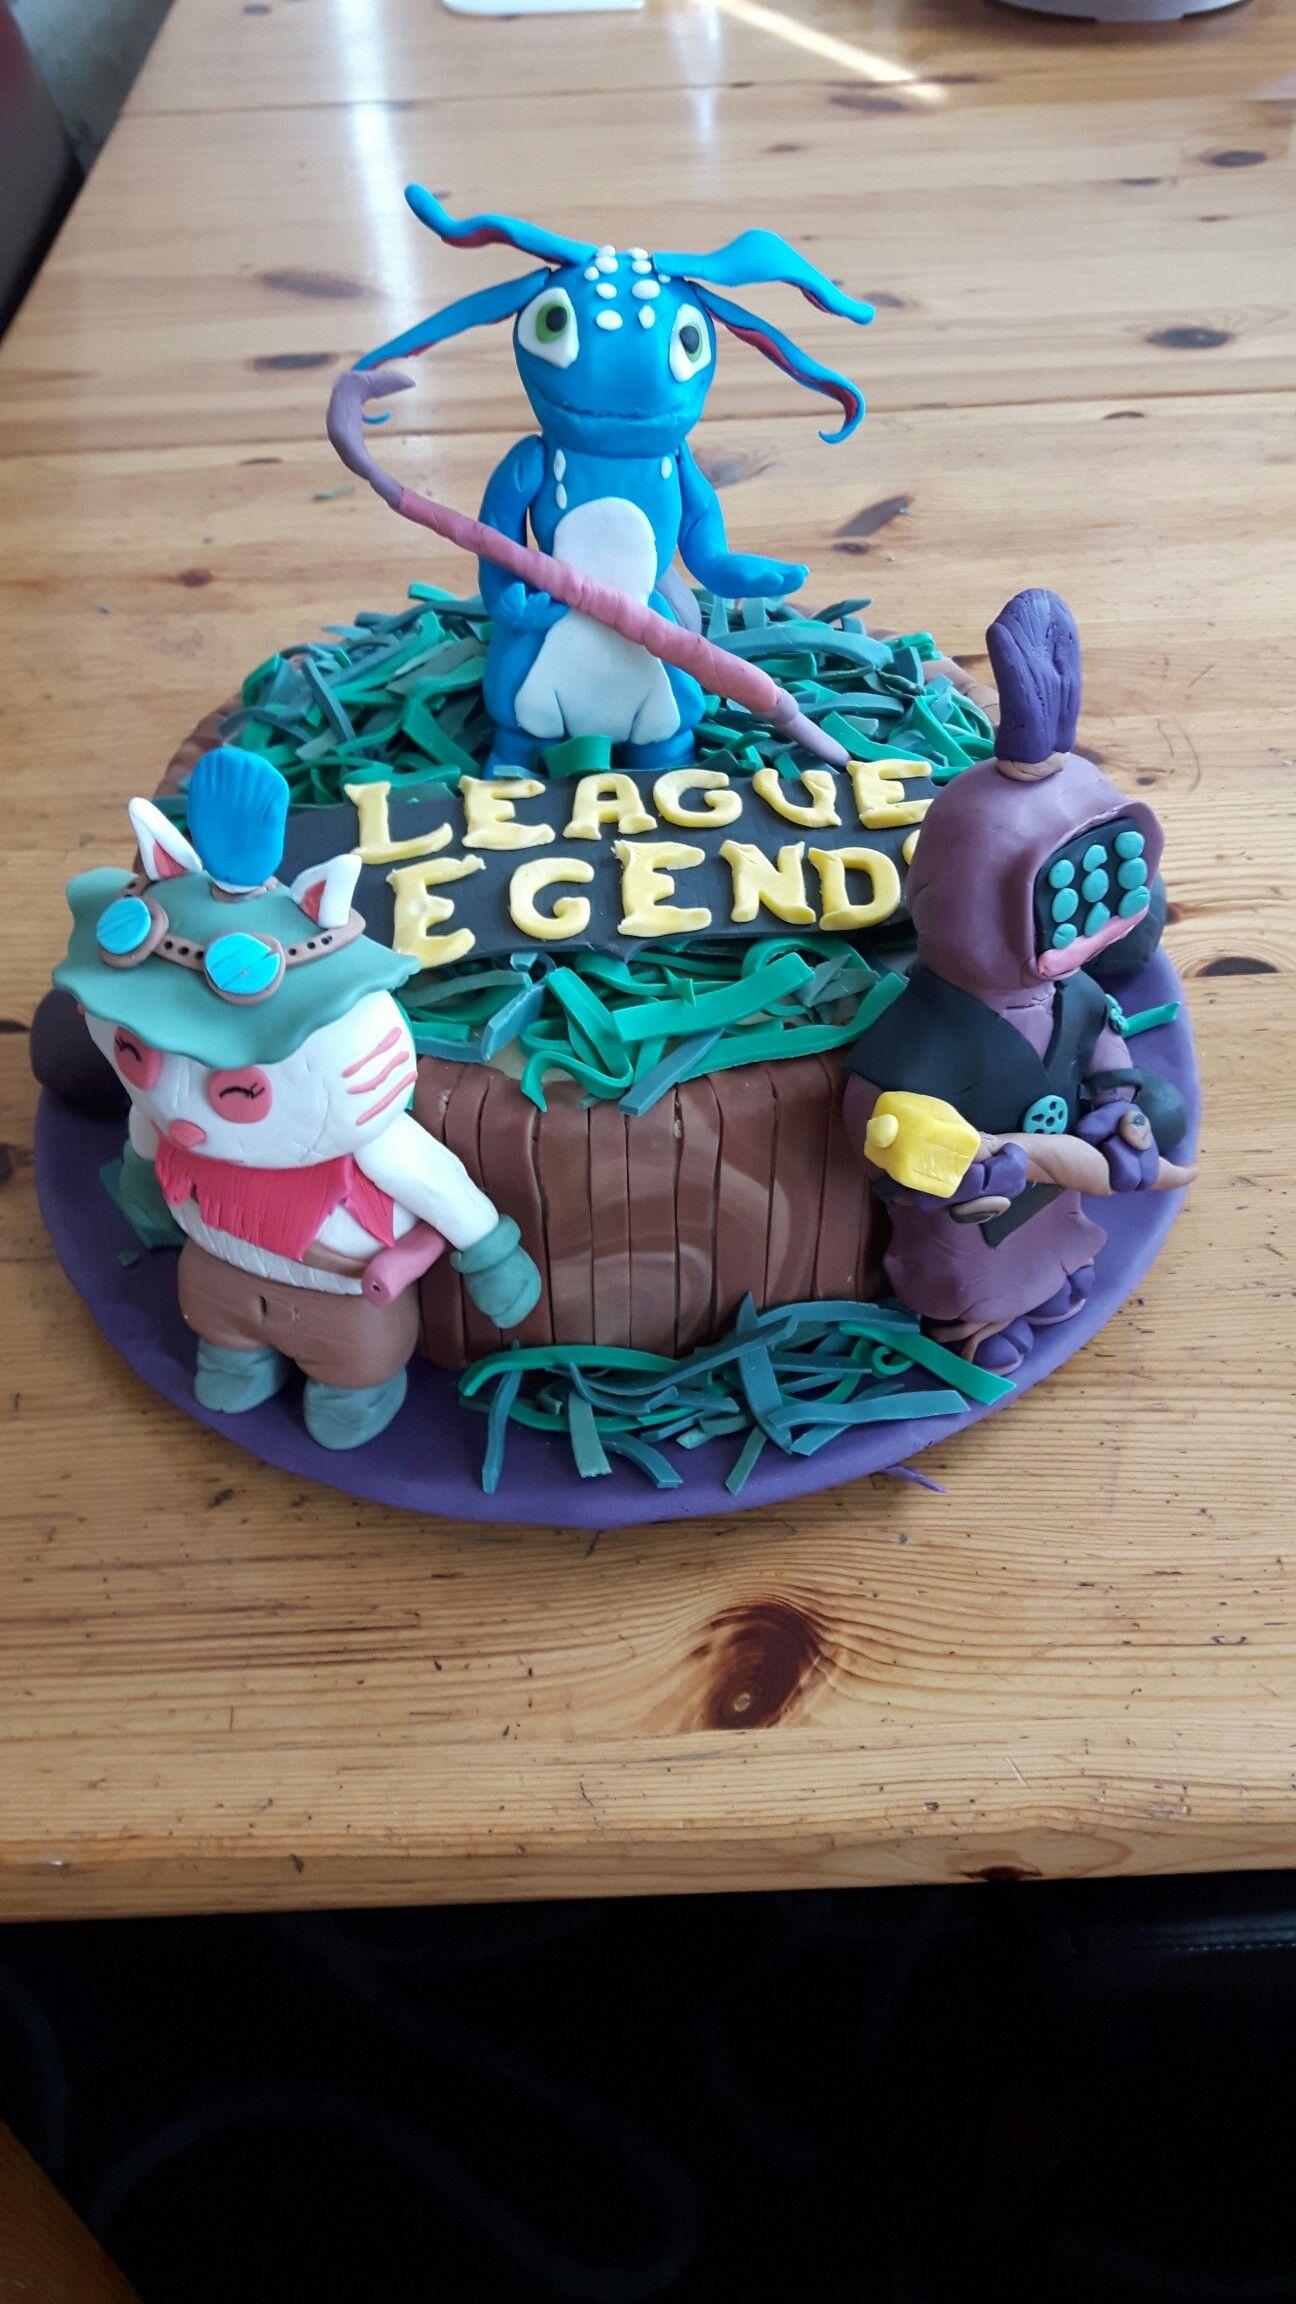 League of legends cake   Novelty cakes, Cake, League of ...